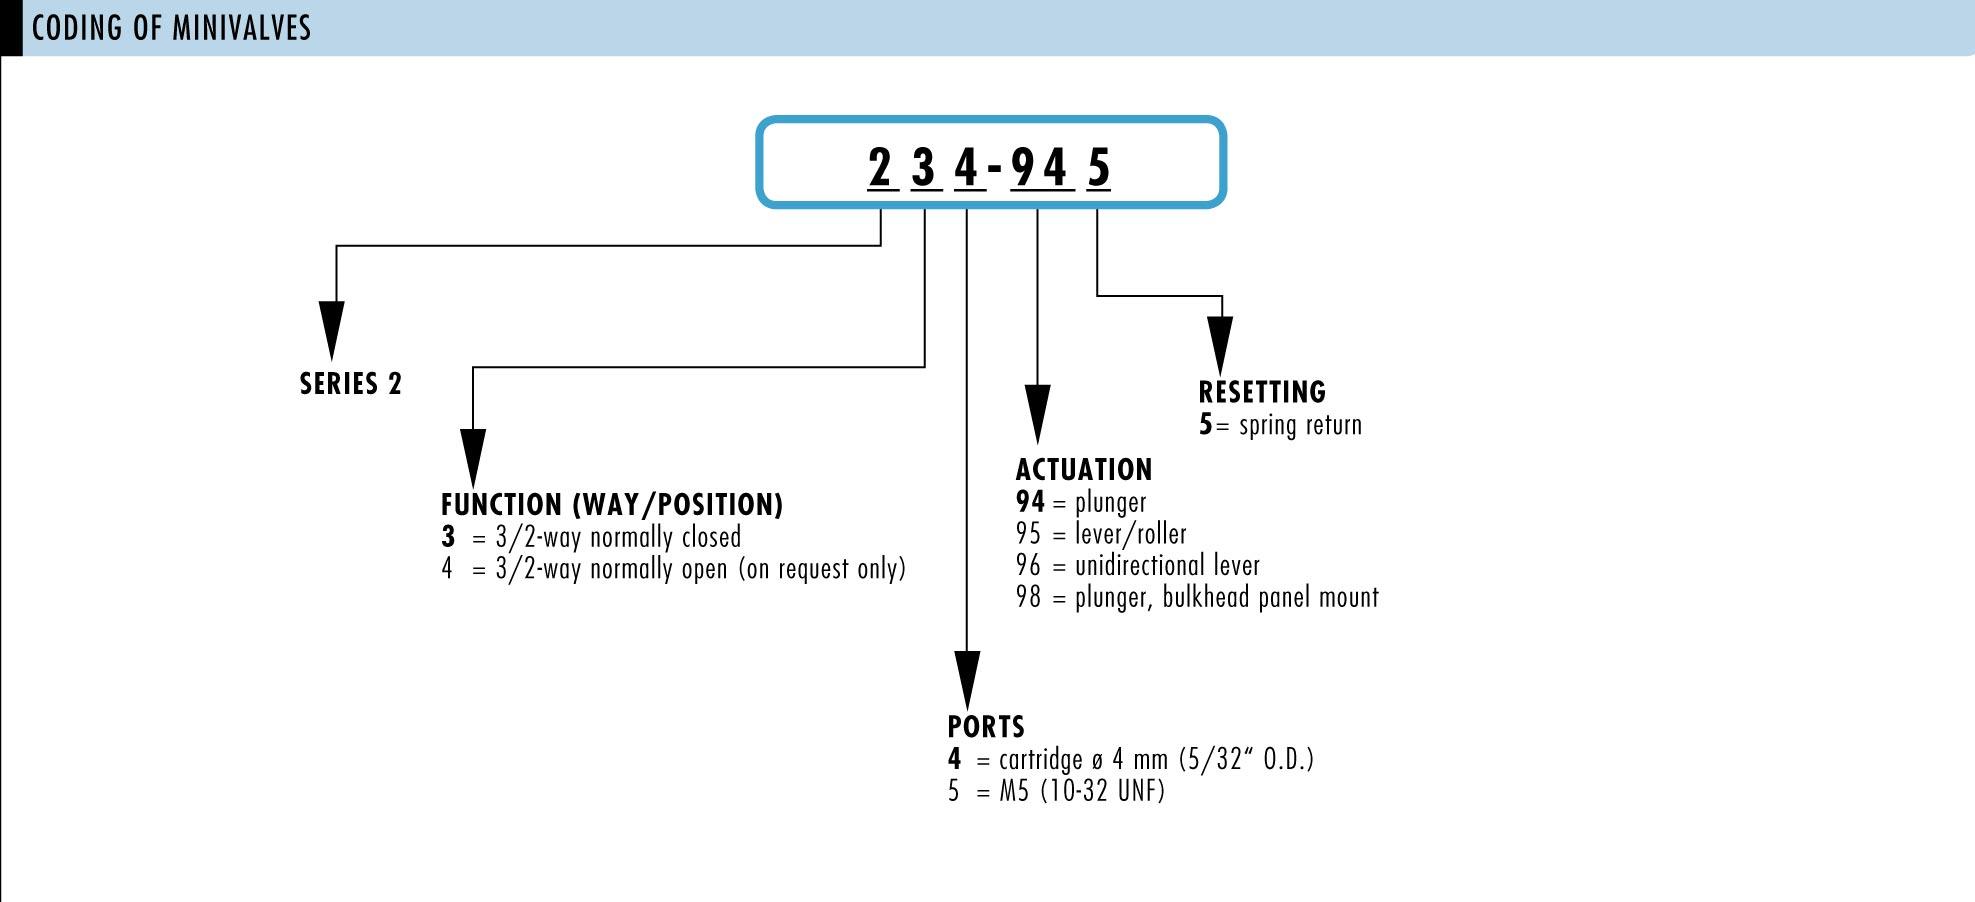 Index of /images/camozzi/valves/mechanical-valves/minivalves